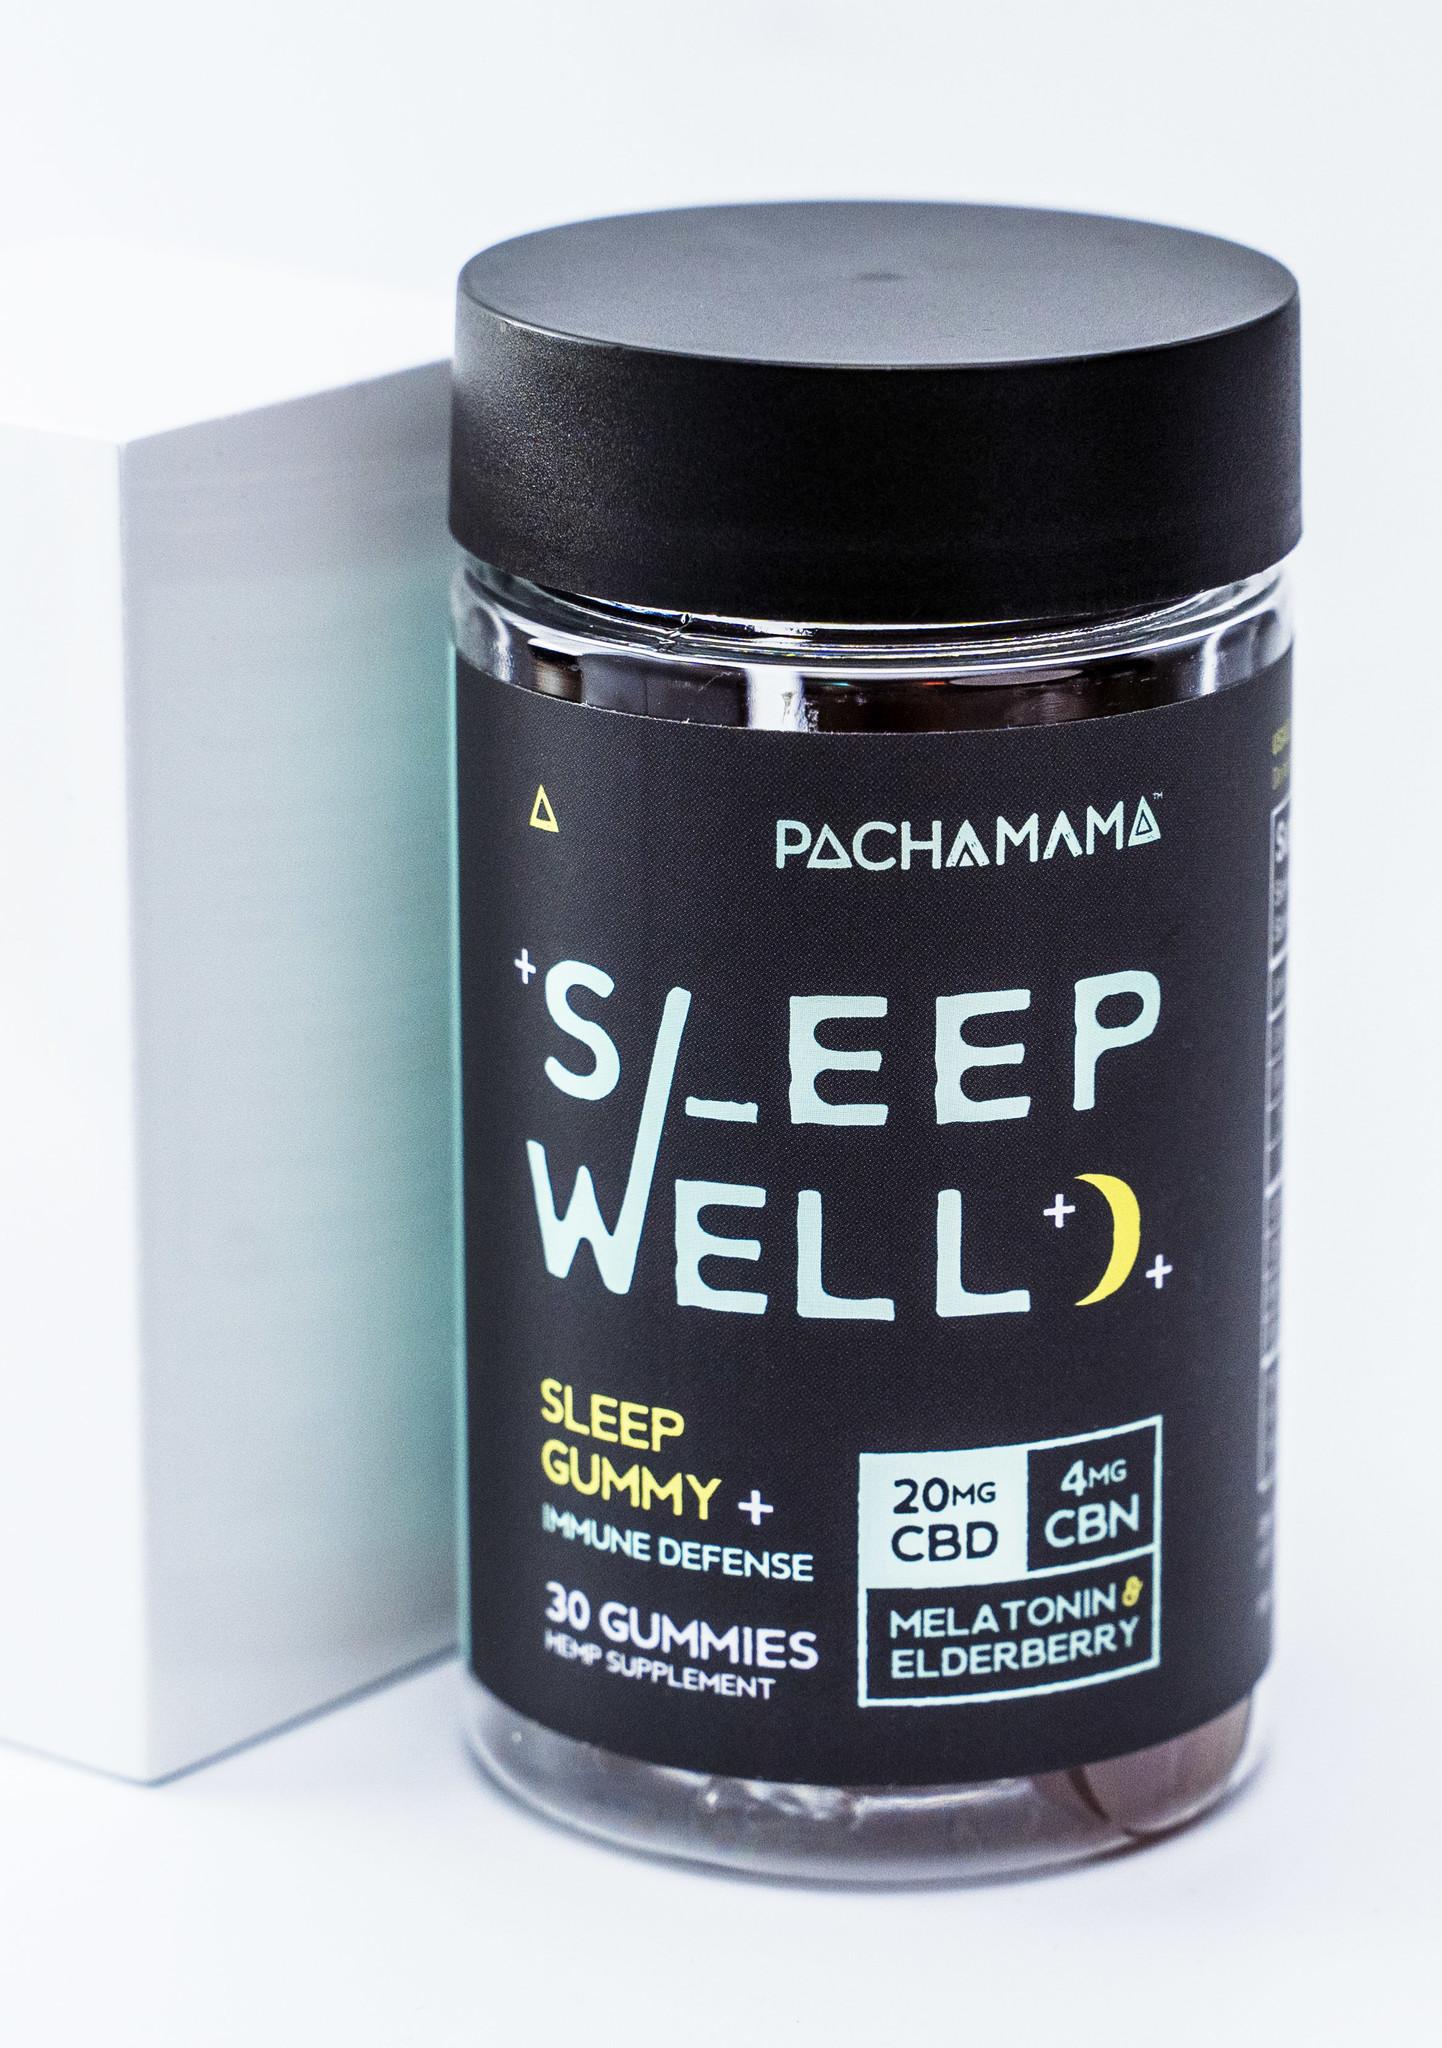 PachaMama CBD | SLEEP GUMMIES | 20mg CBD | 4mg CBN | 2mg MELATONIN | 35mg ELDERBERRY | 30 COUNT